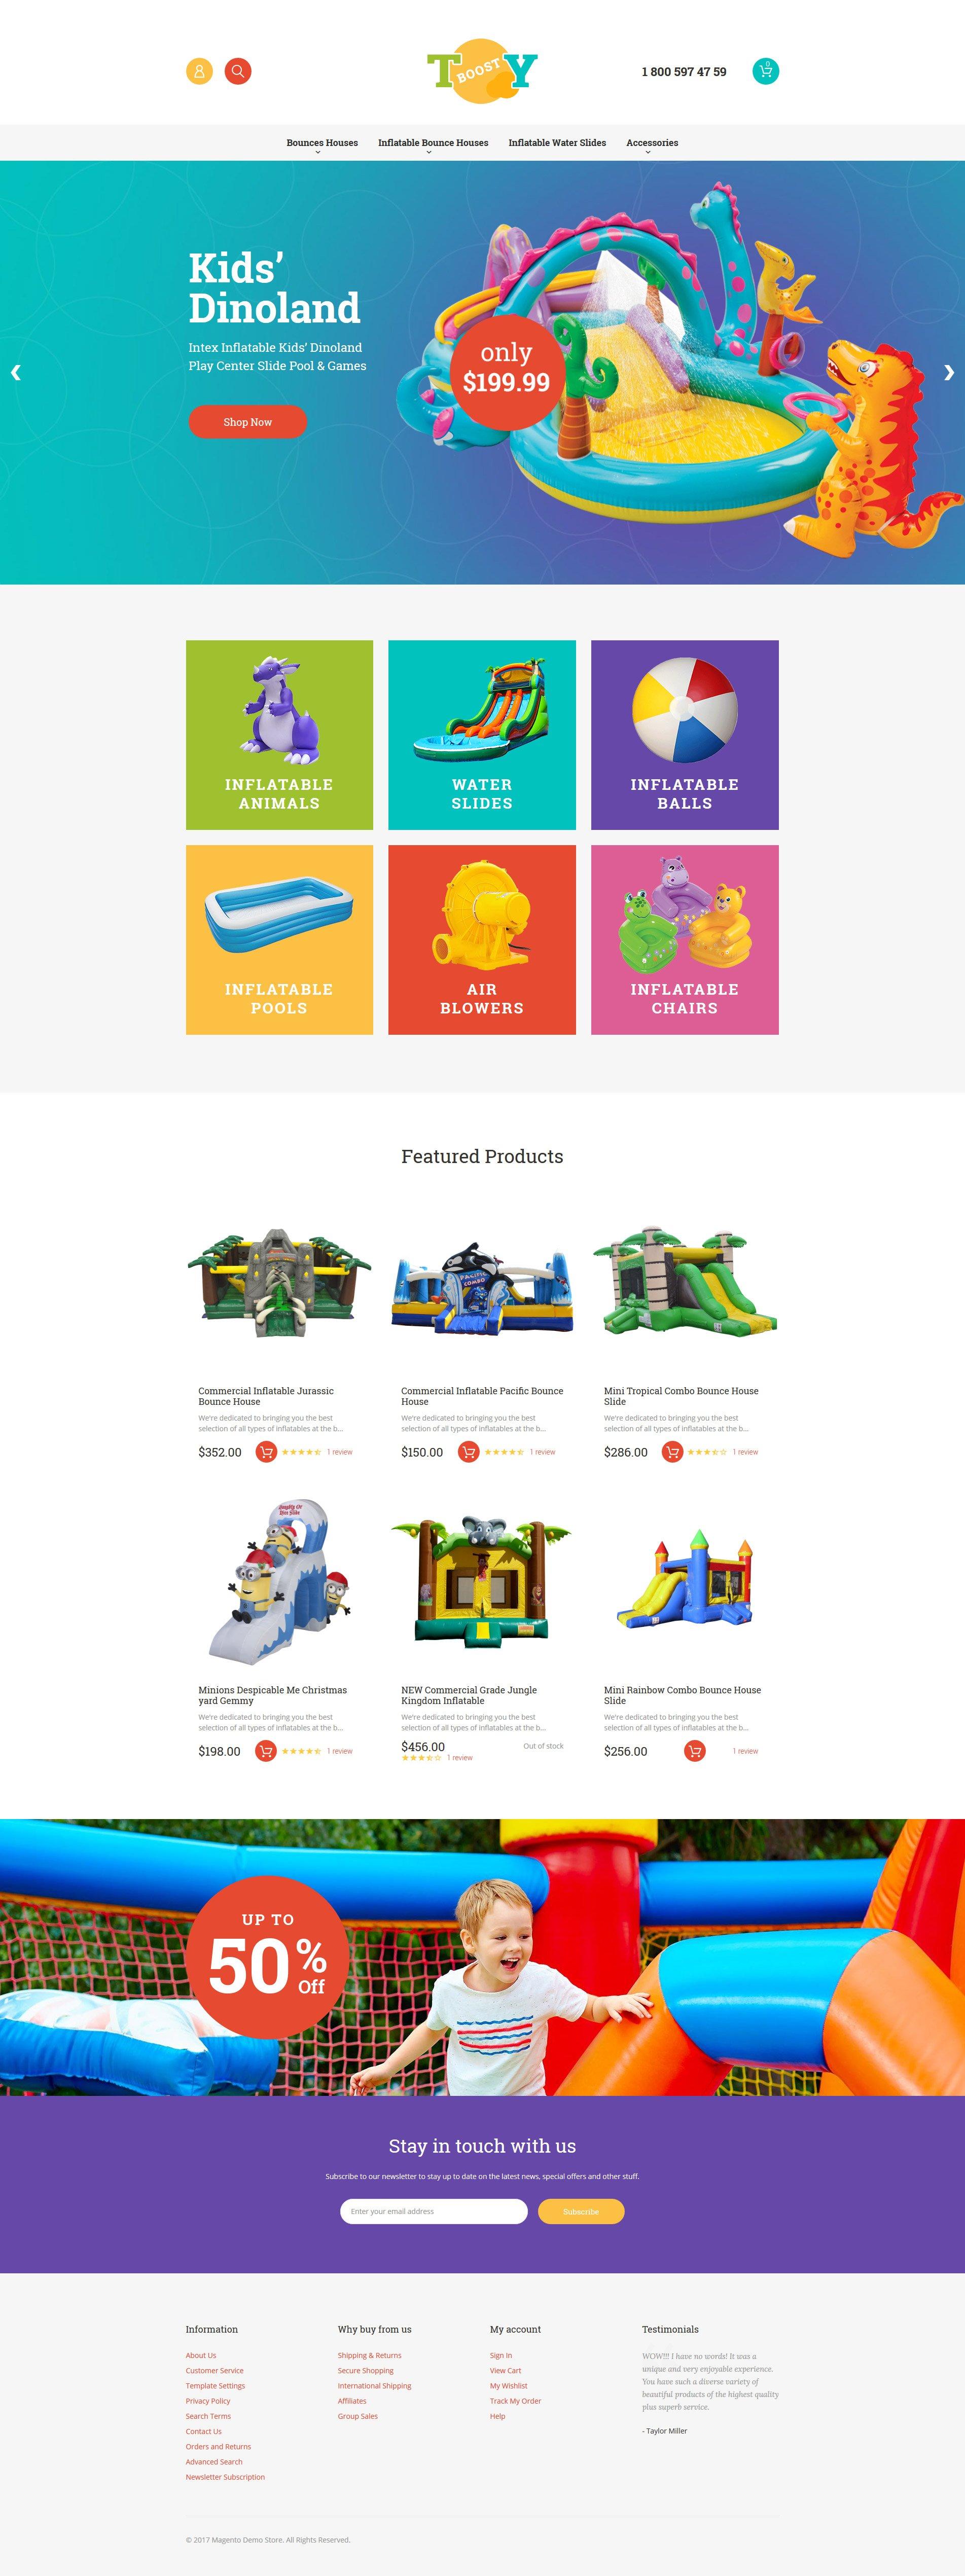 Responsywny szablon Magento Inflatable Toys #62247 - zrzut ekranu